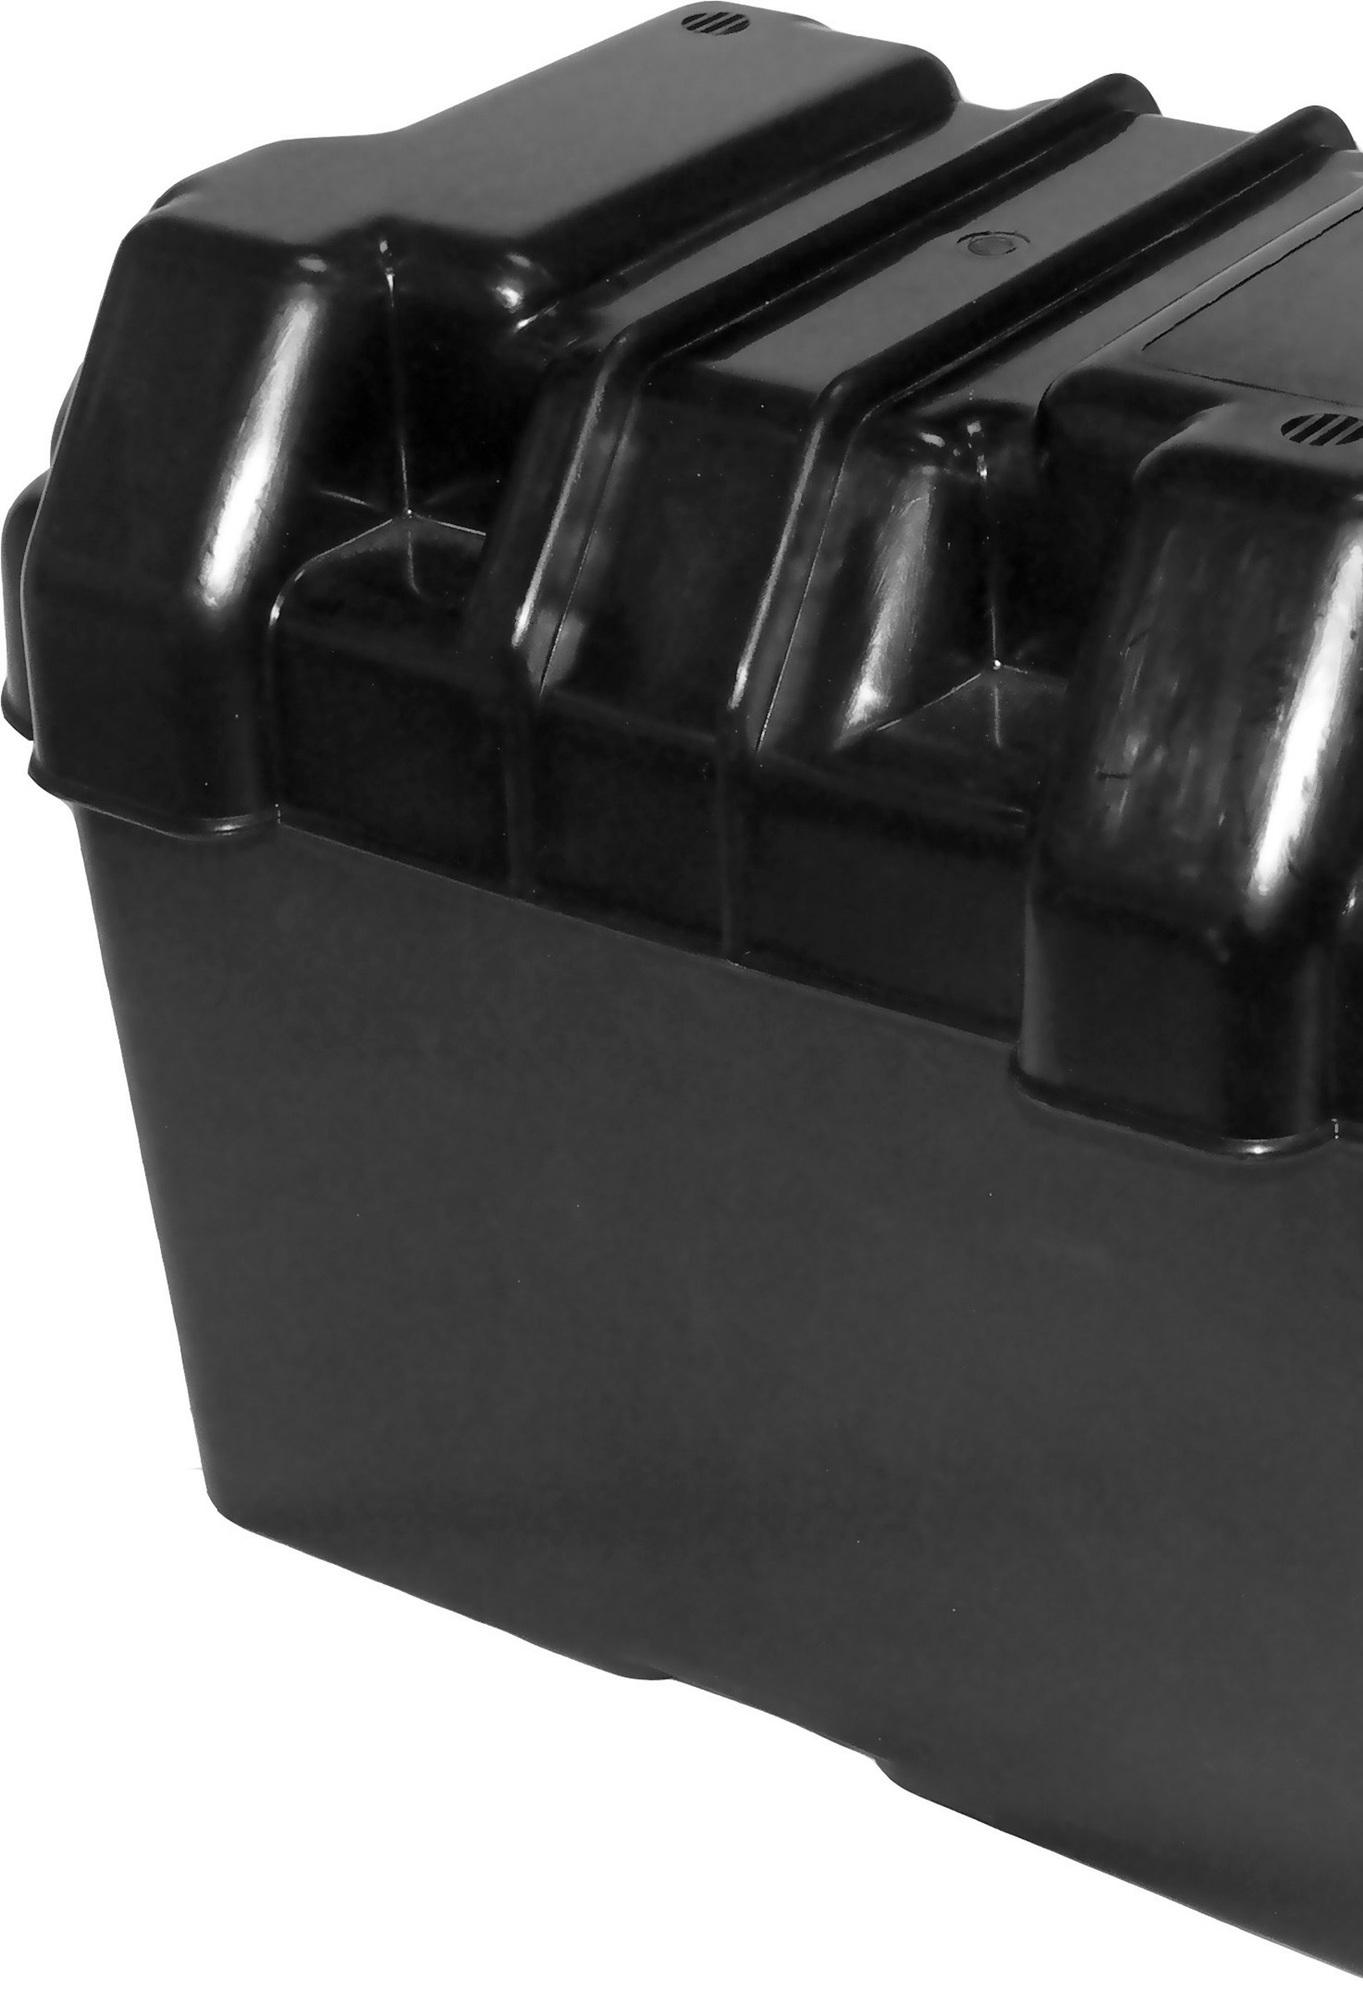 Shoreline Marine SL52078 Battery Box 27M With Strap